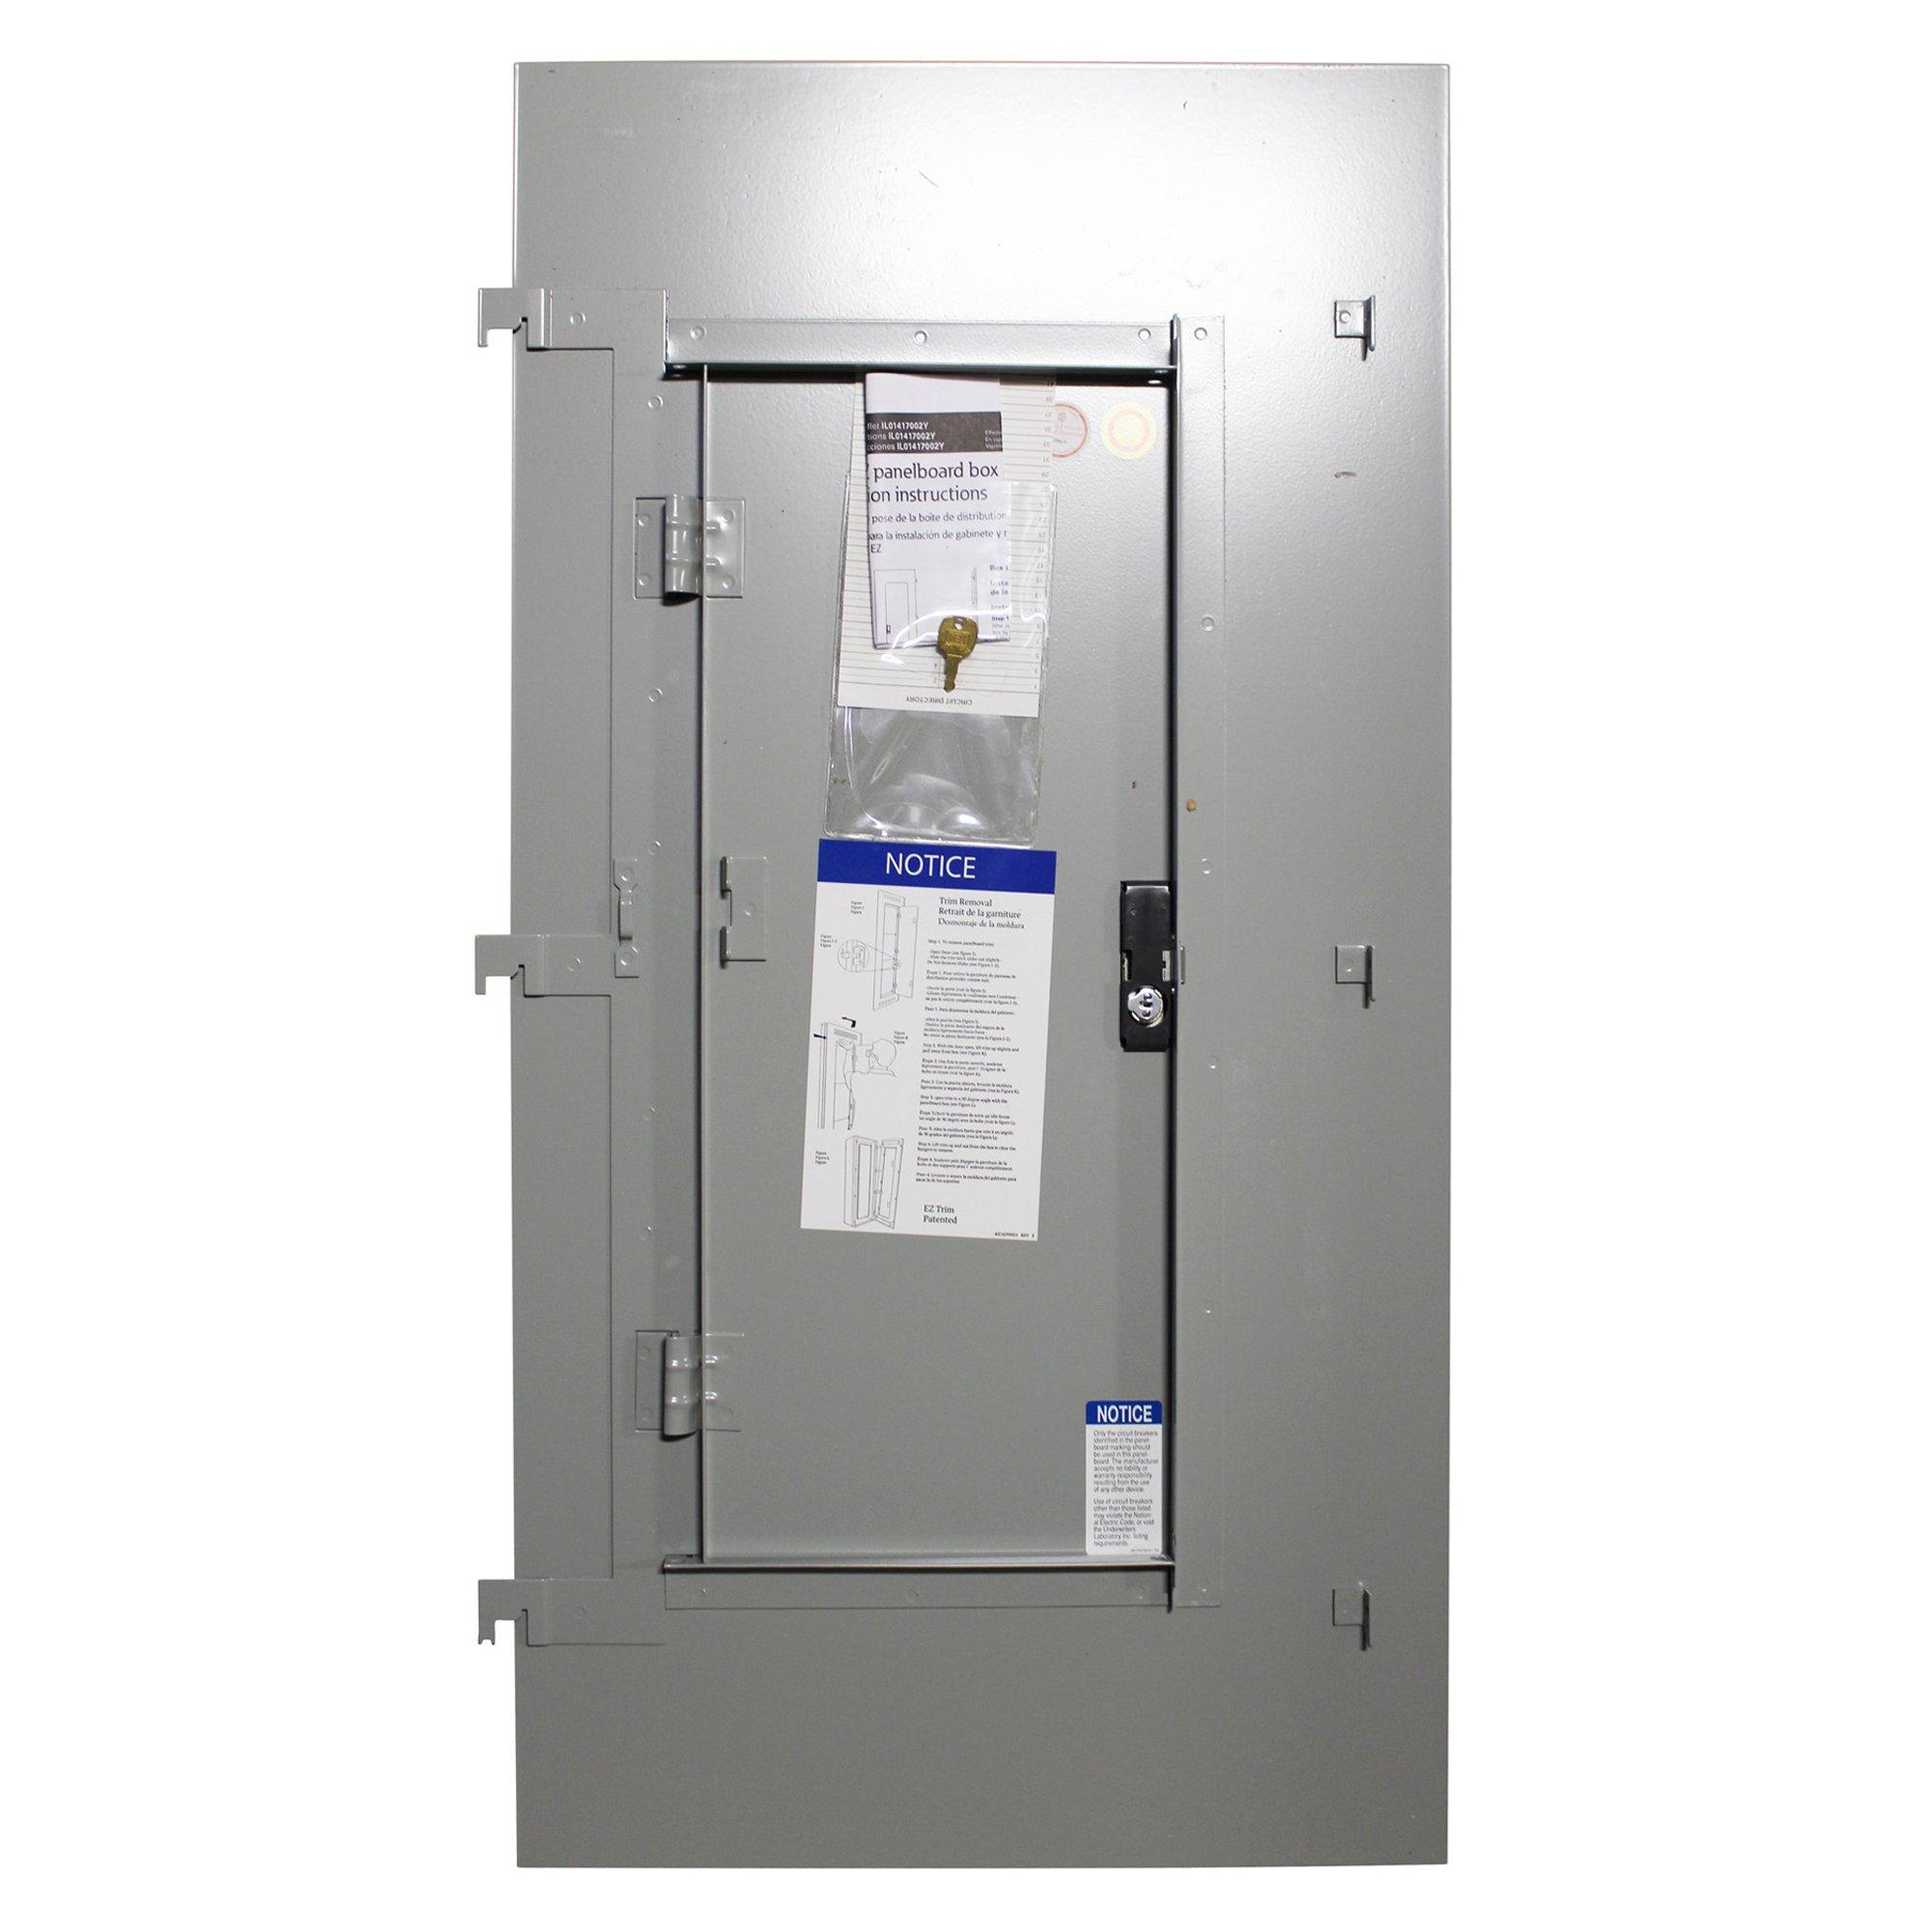 Eaton Cutler-Hammer EZT2036F Panel Board Flush Trim Kit / Door, 36'' X 20''